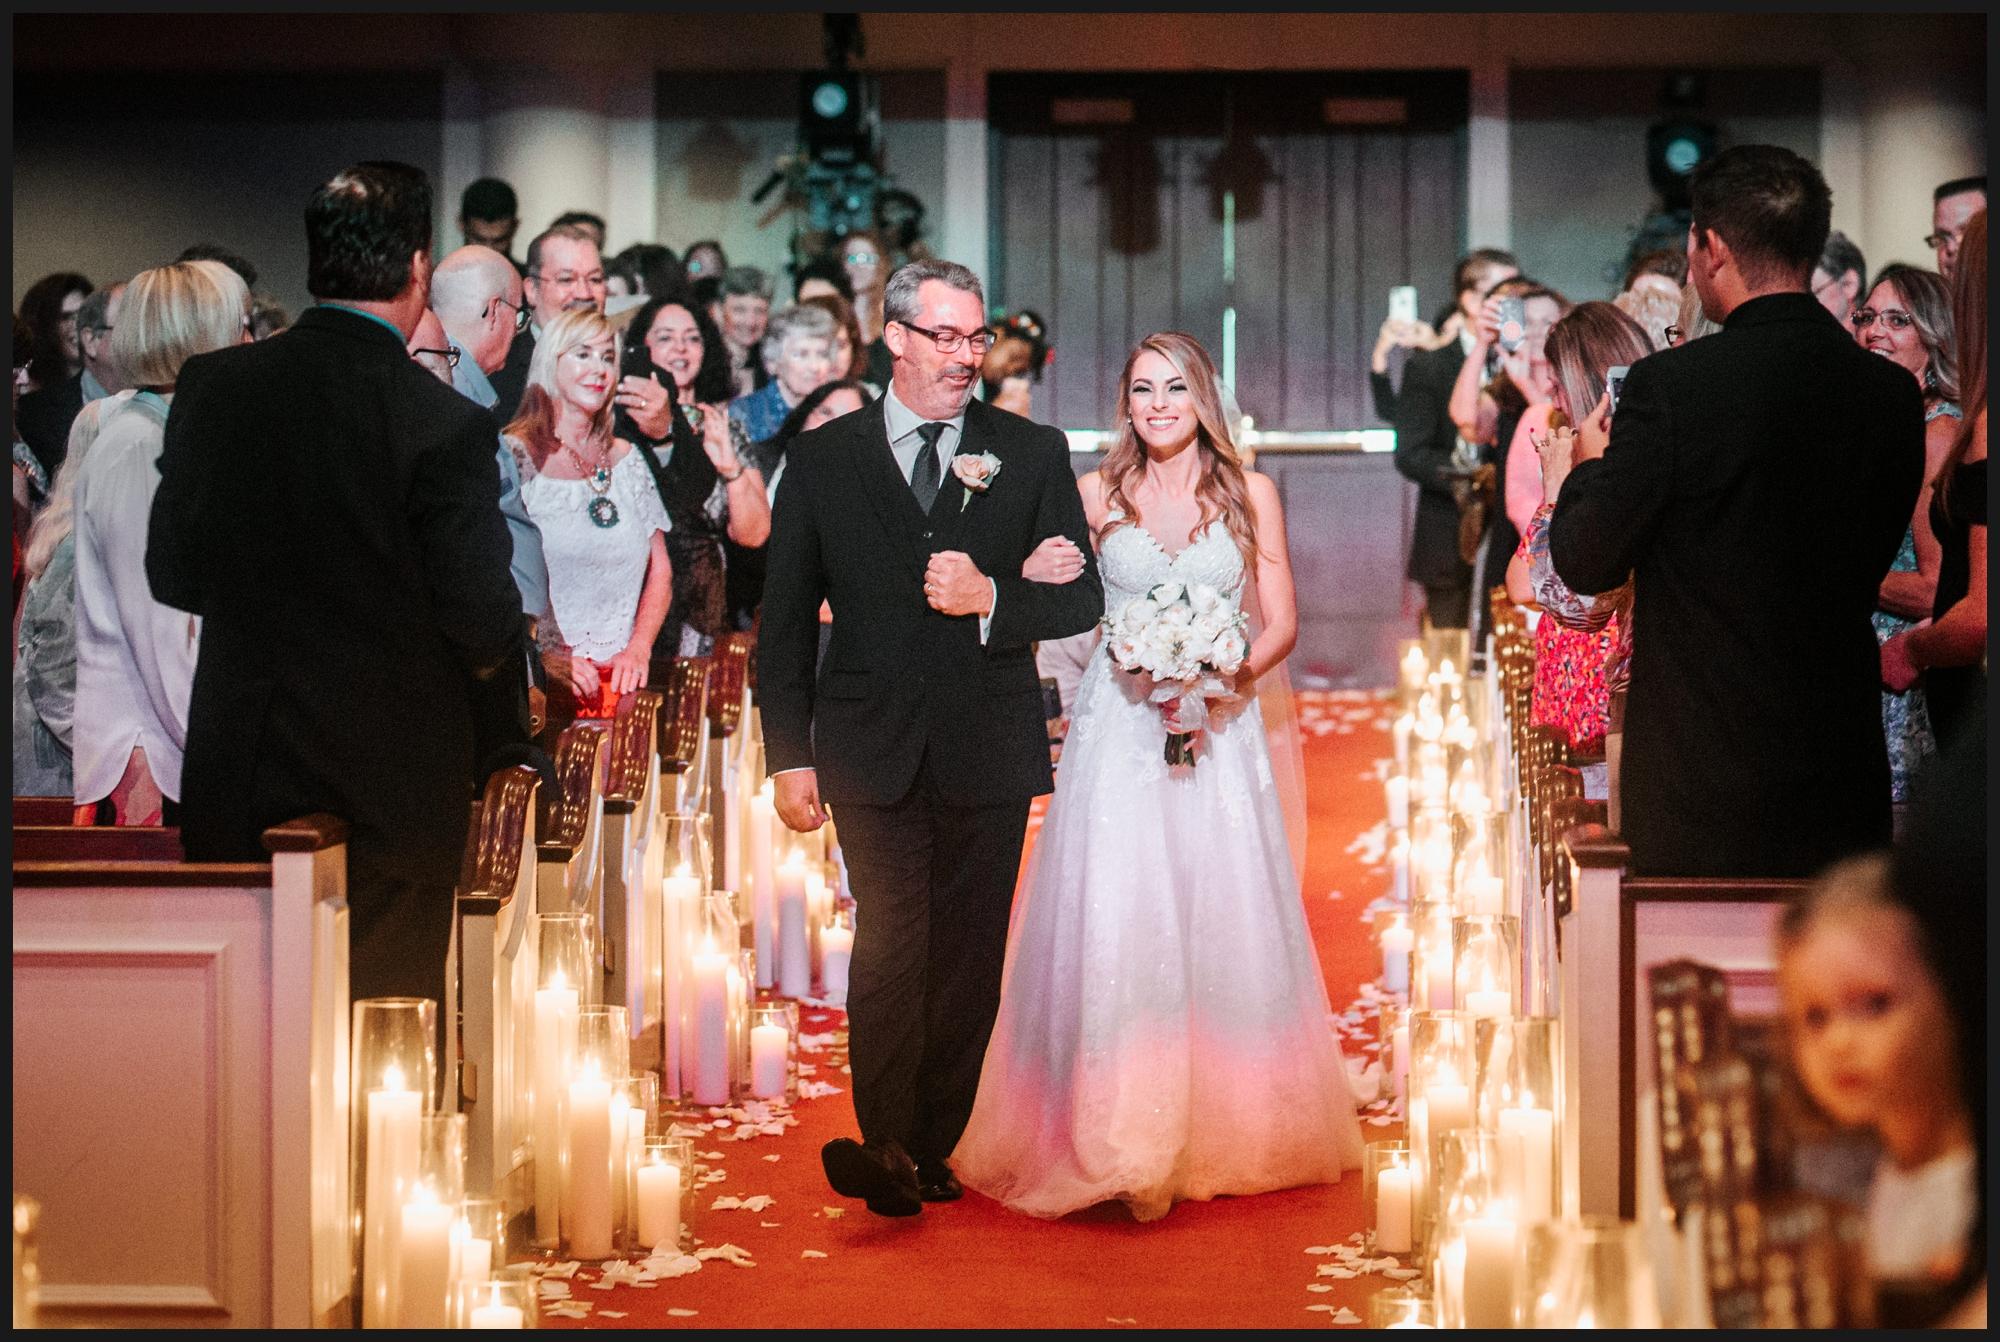 Orlando-Wedding-Photographer-destination-wedding-photographer-florida-wedding-photographer-bohemian-wedding-photographer_0073.jpg